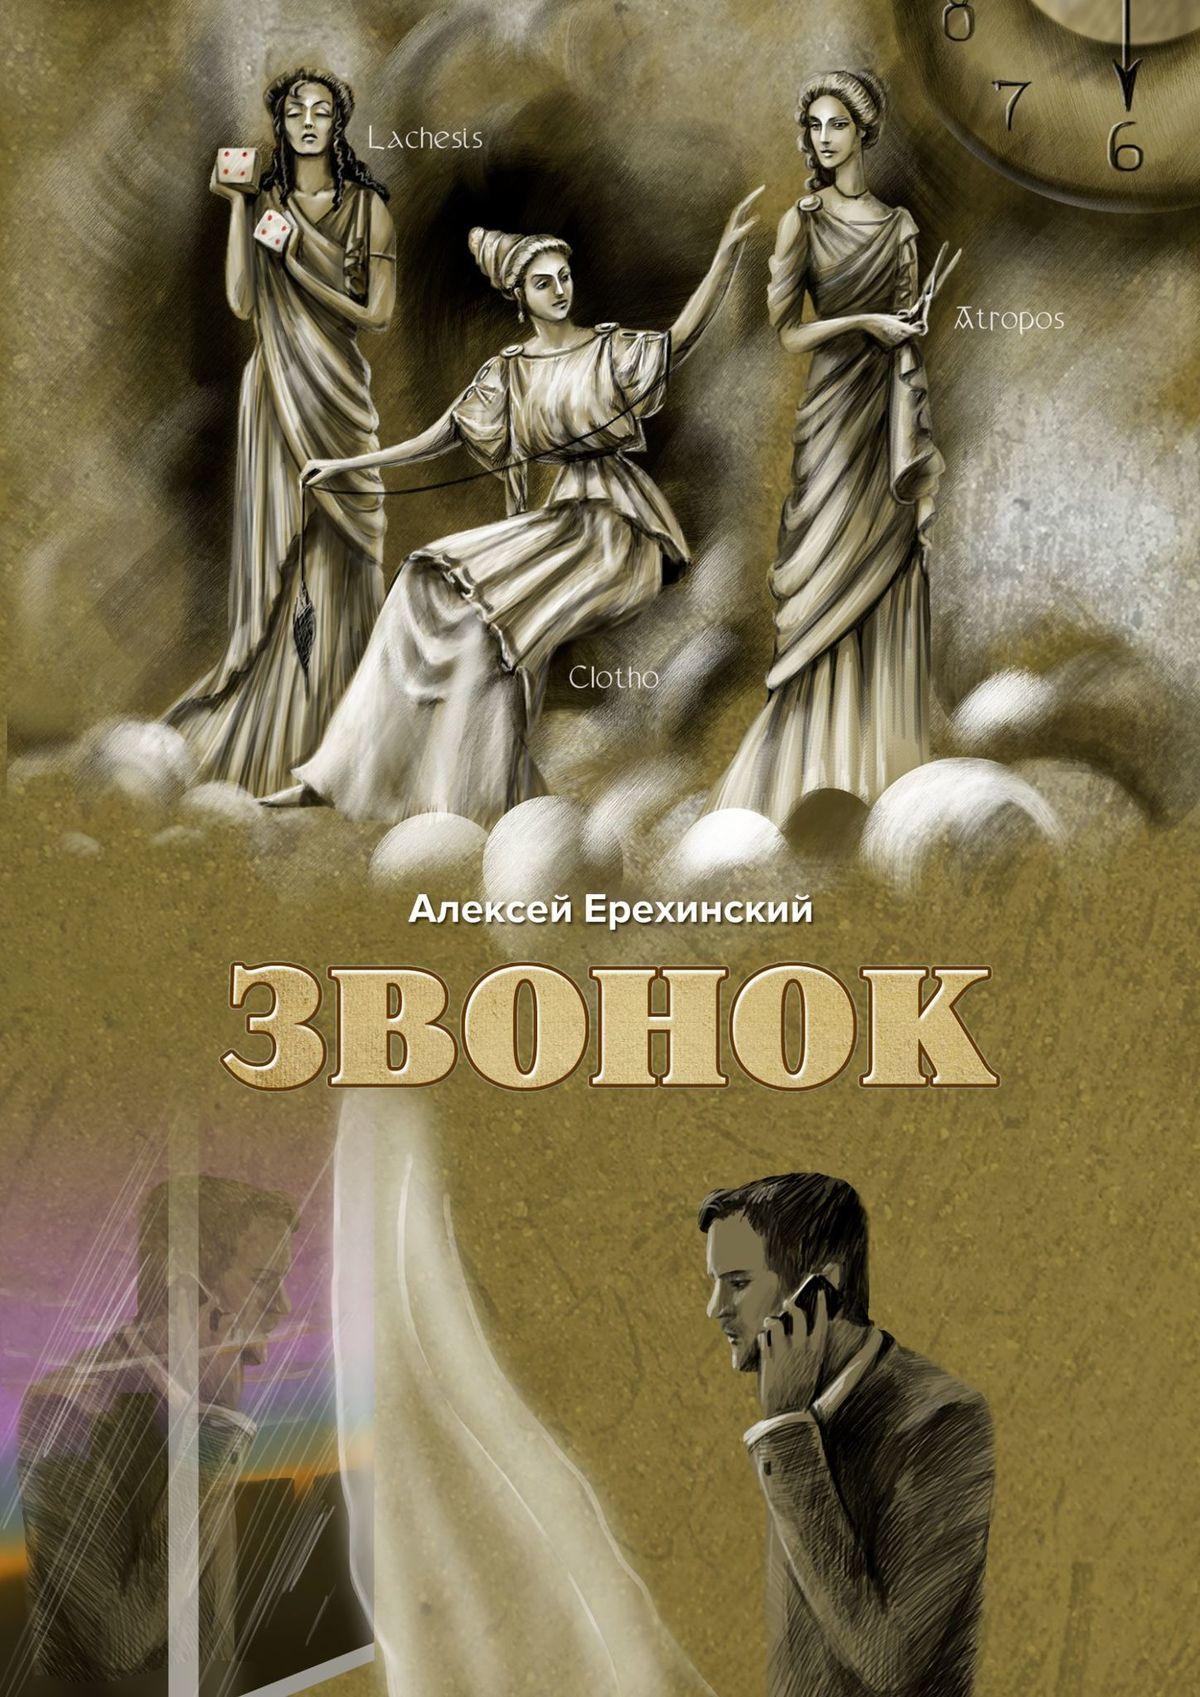 цена на Алексей Ерехинский Звонок